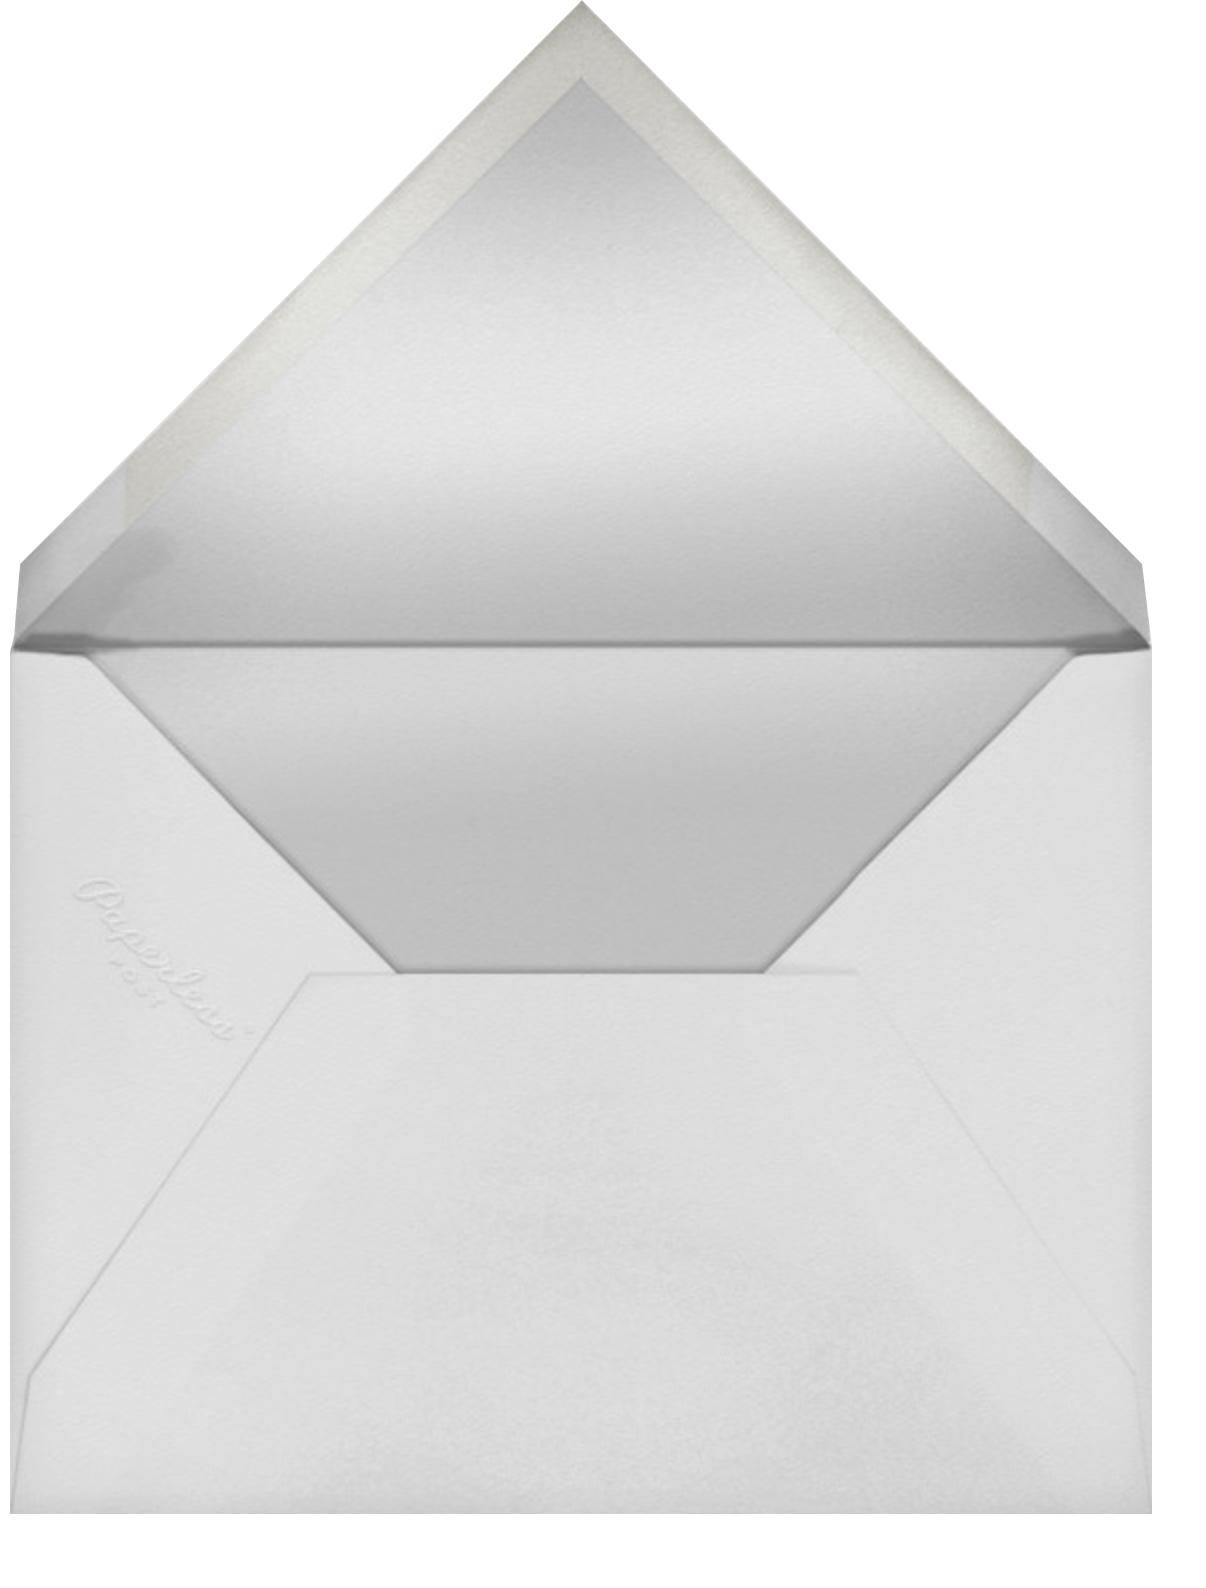 Lucky Duck - Paperless Post - Baby shower - envelope back